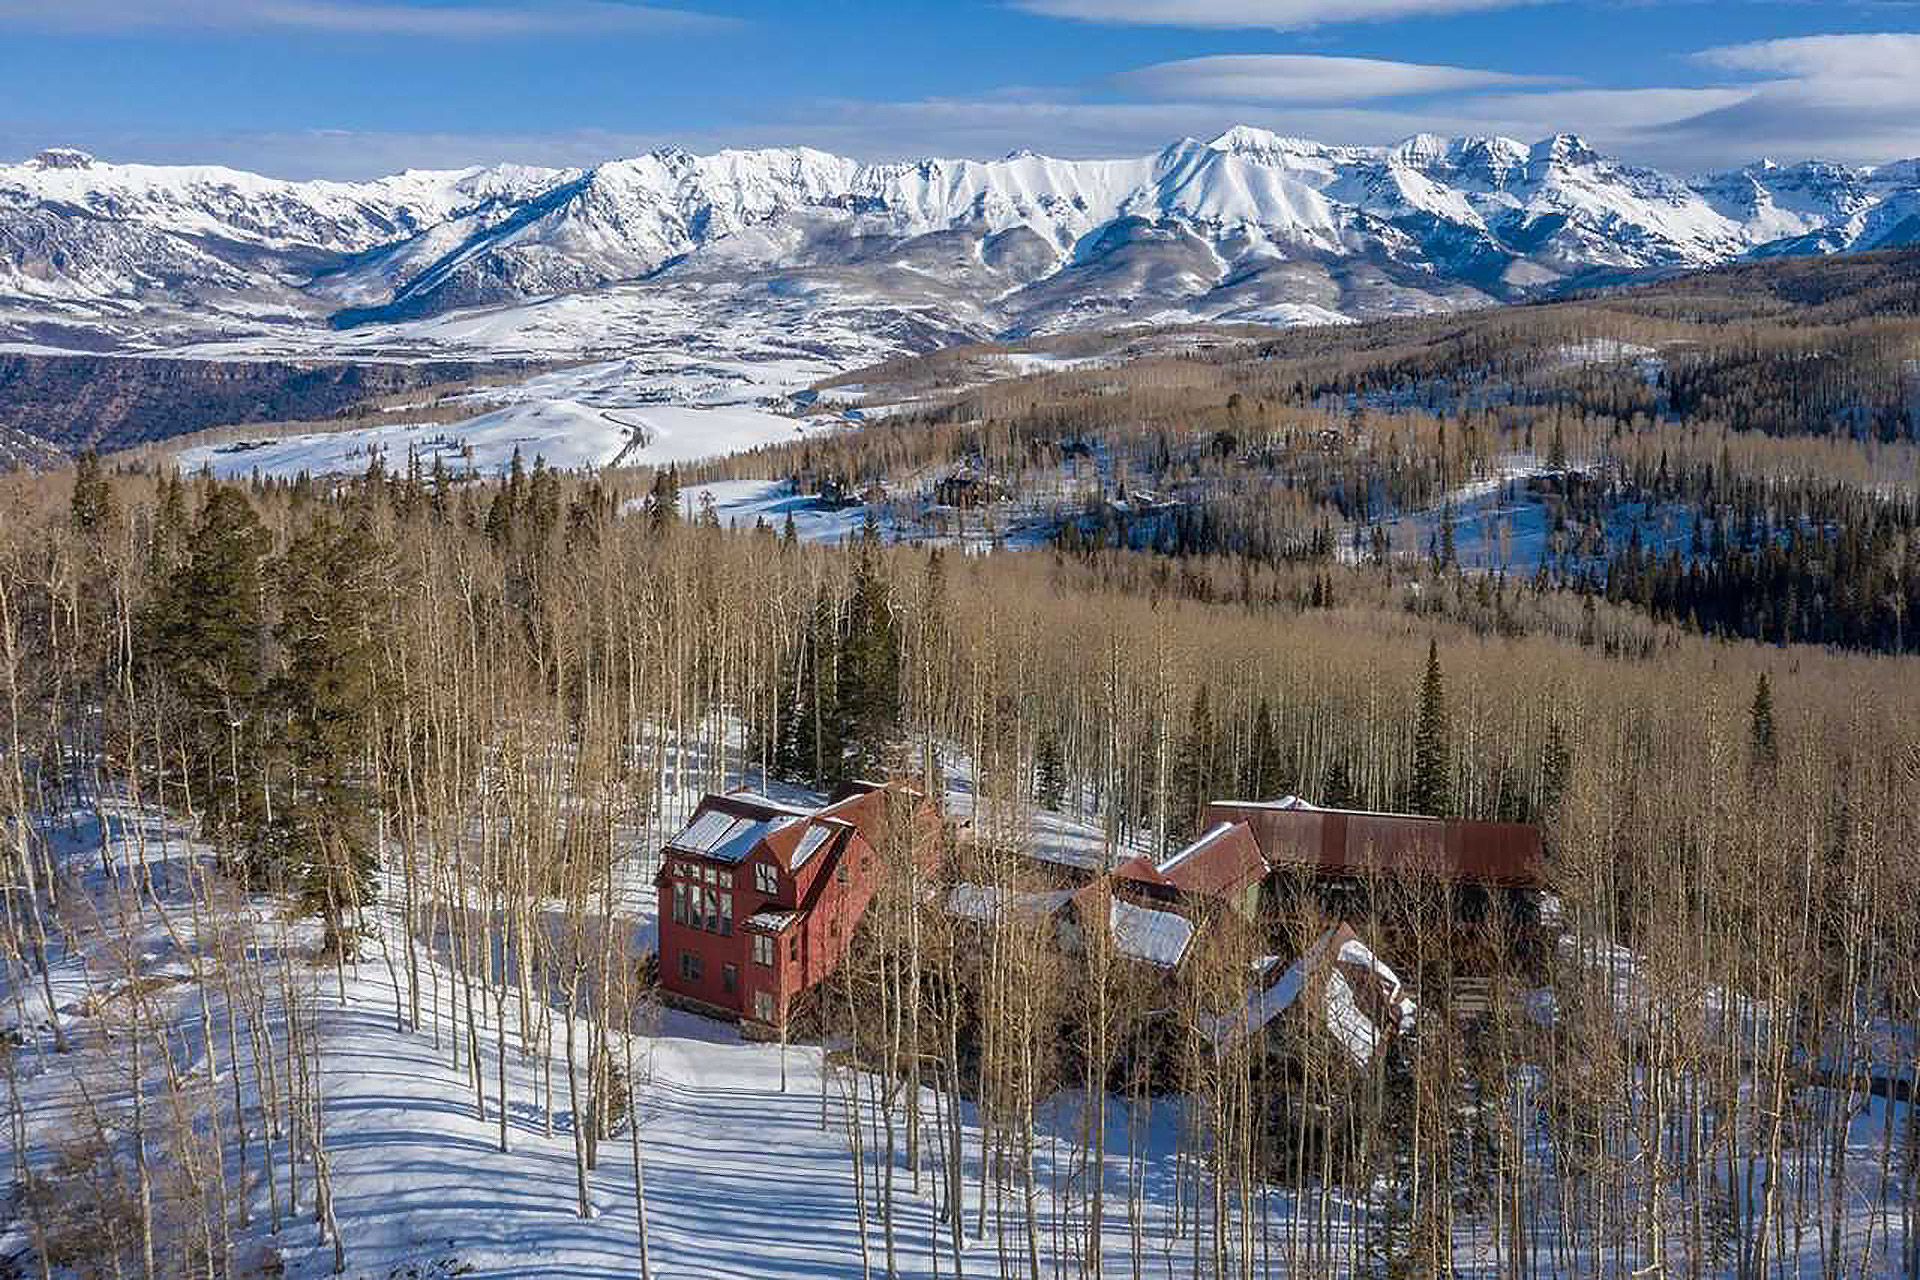 Jerry Seinfeld's Telluride Ski House